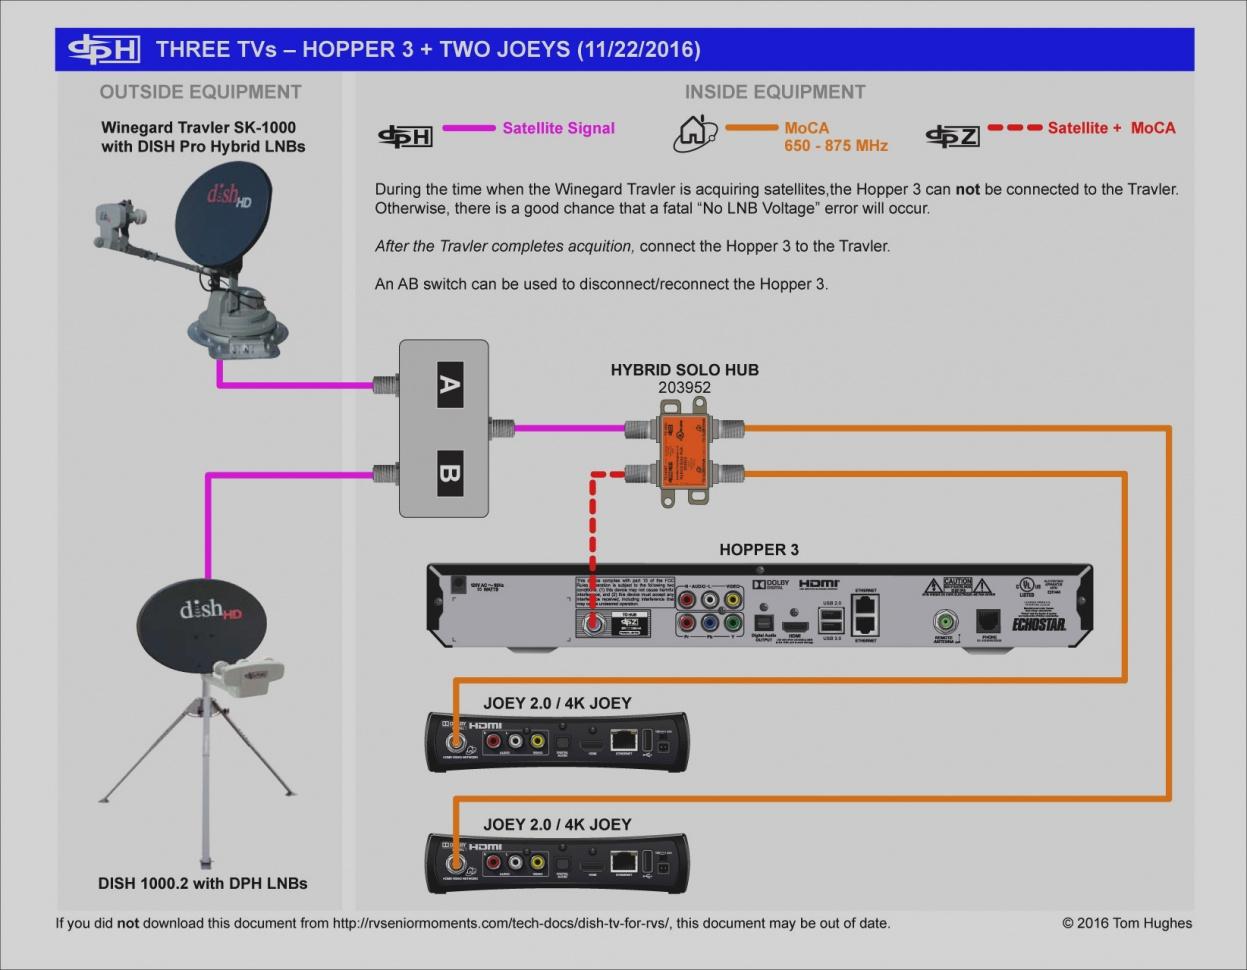 hight resolution of dish 1000 wiring diagram wiring diagram schematic dish 1000 2 wiring diagram